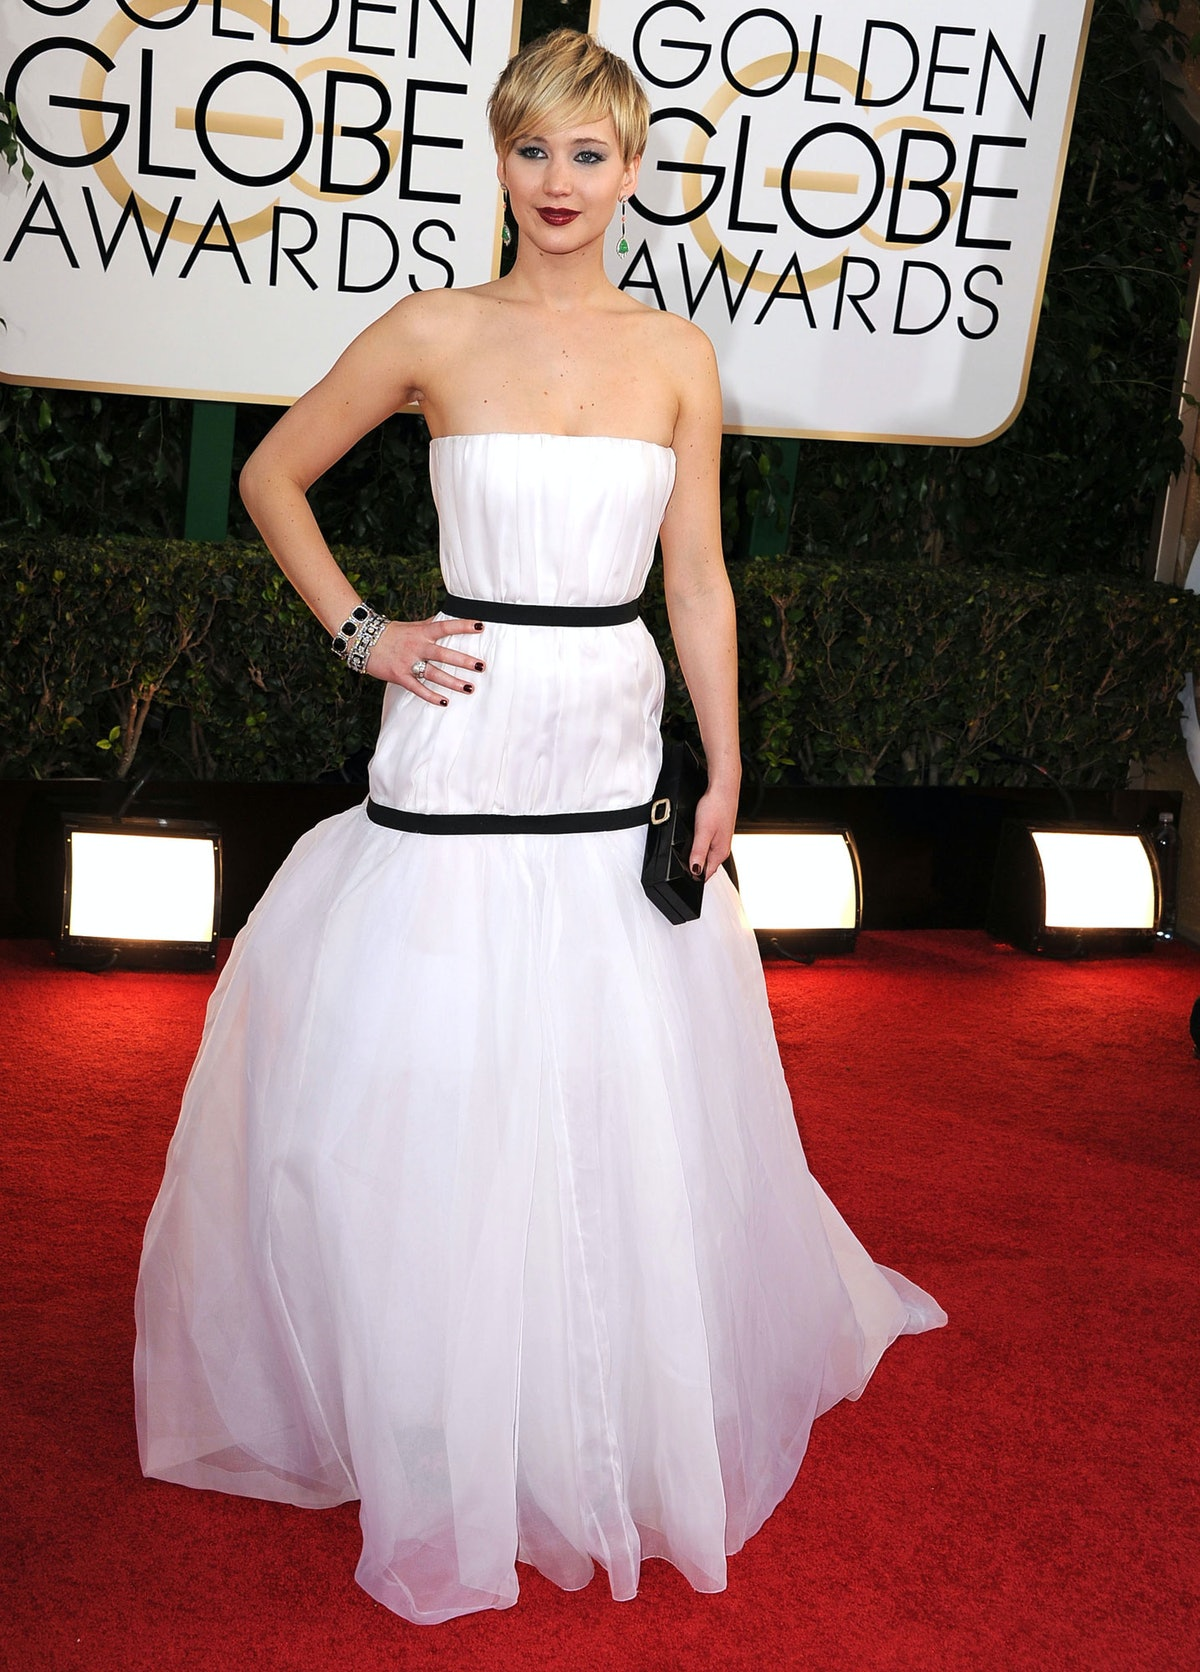 [Jennifer Lawrence](http://www.wmagazine.com/mood-board/filter?q=%5ECelebrity%7CJennifer%20Lawrence%...